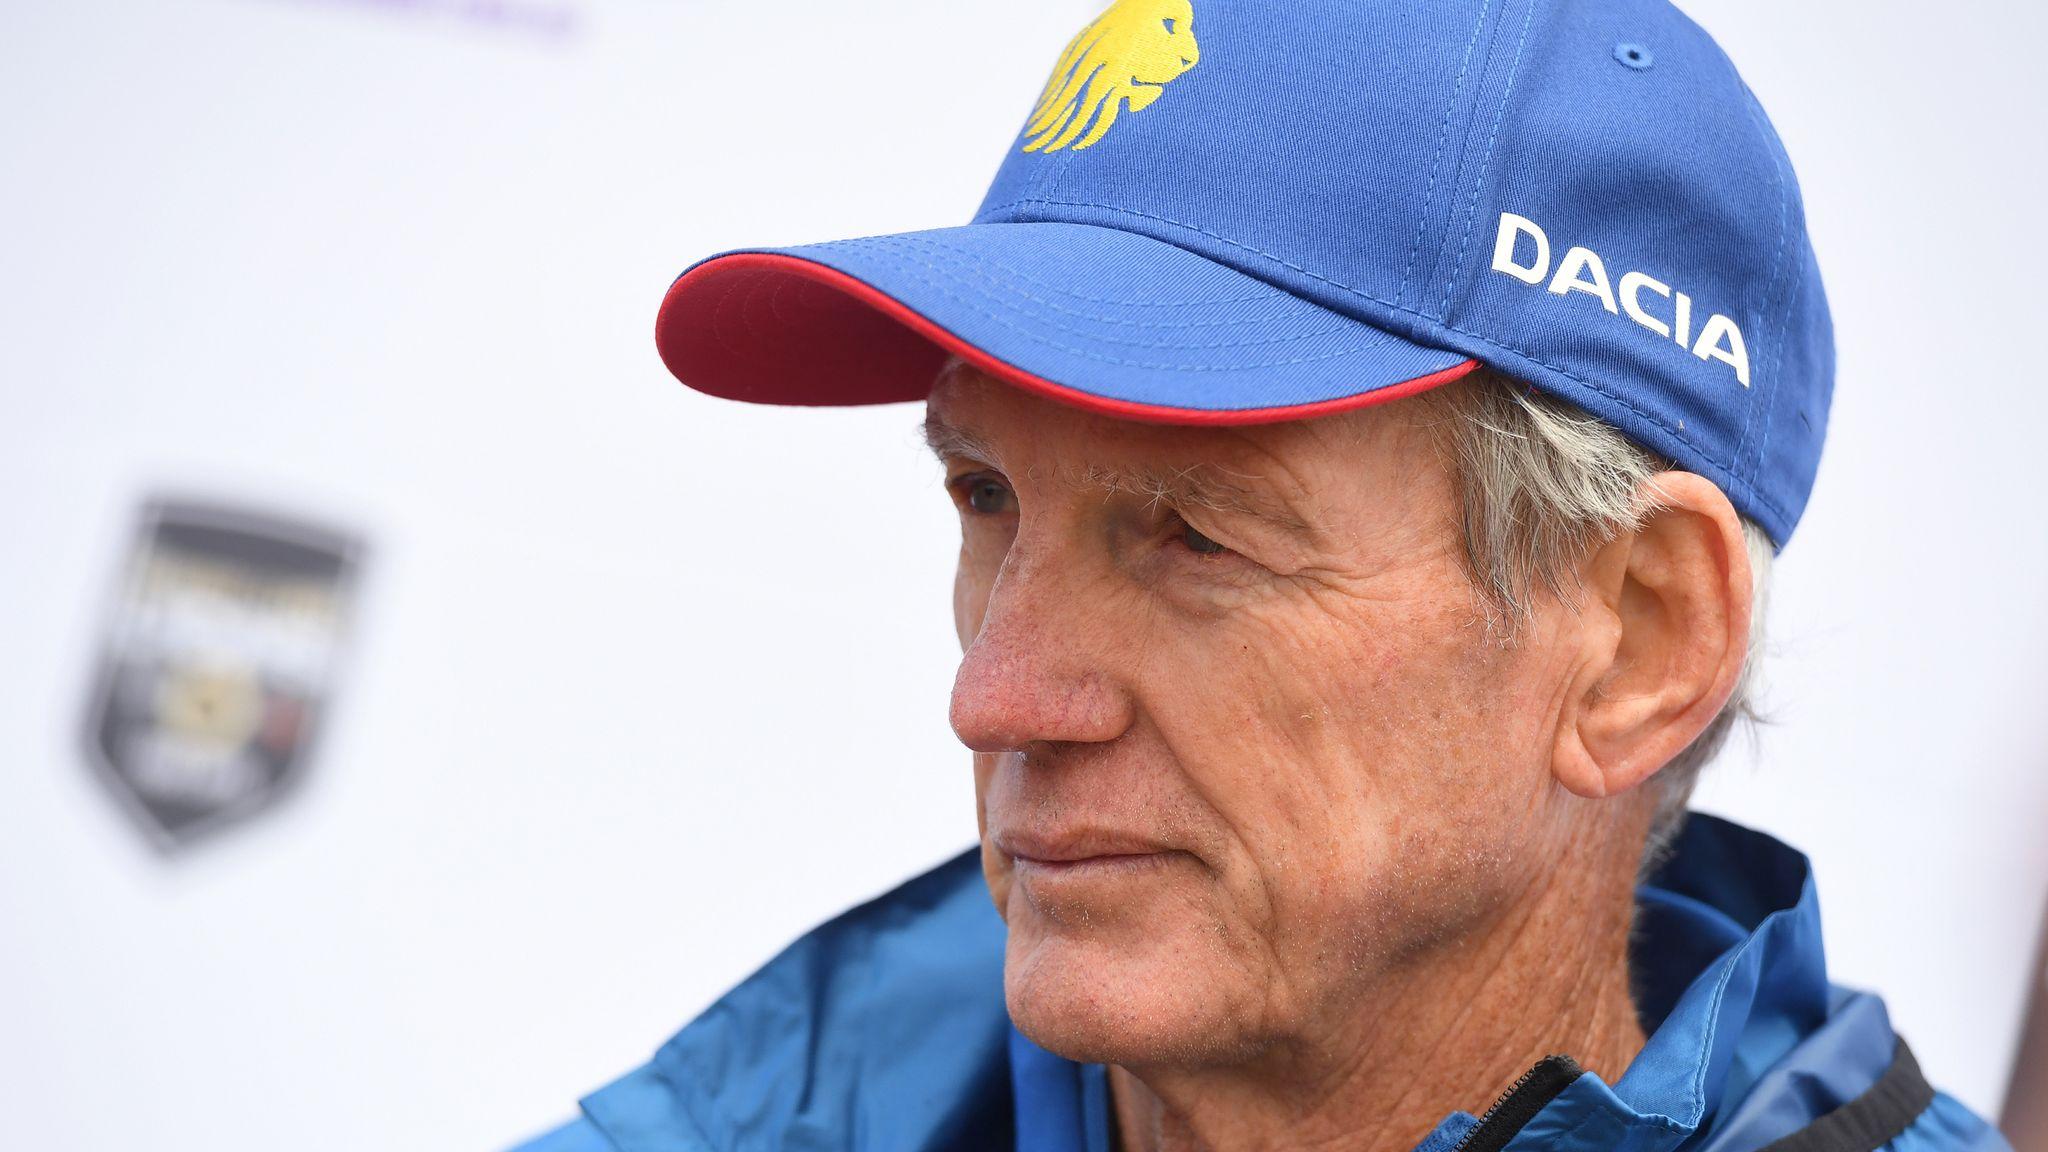 Great Britain head coach Wayne Bennett sees international game getting stronger after whitewash